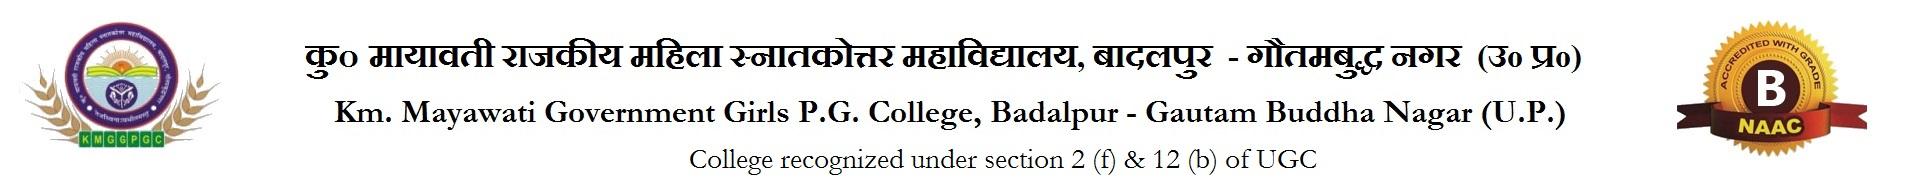 Km Mayawati Government Girls PG College – Website